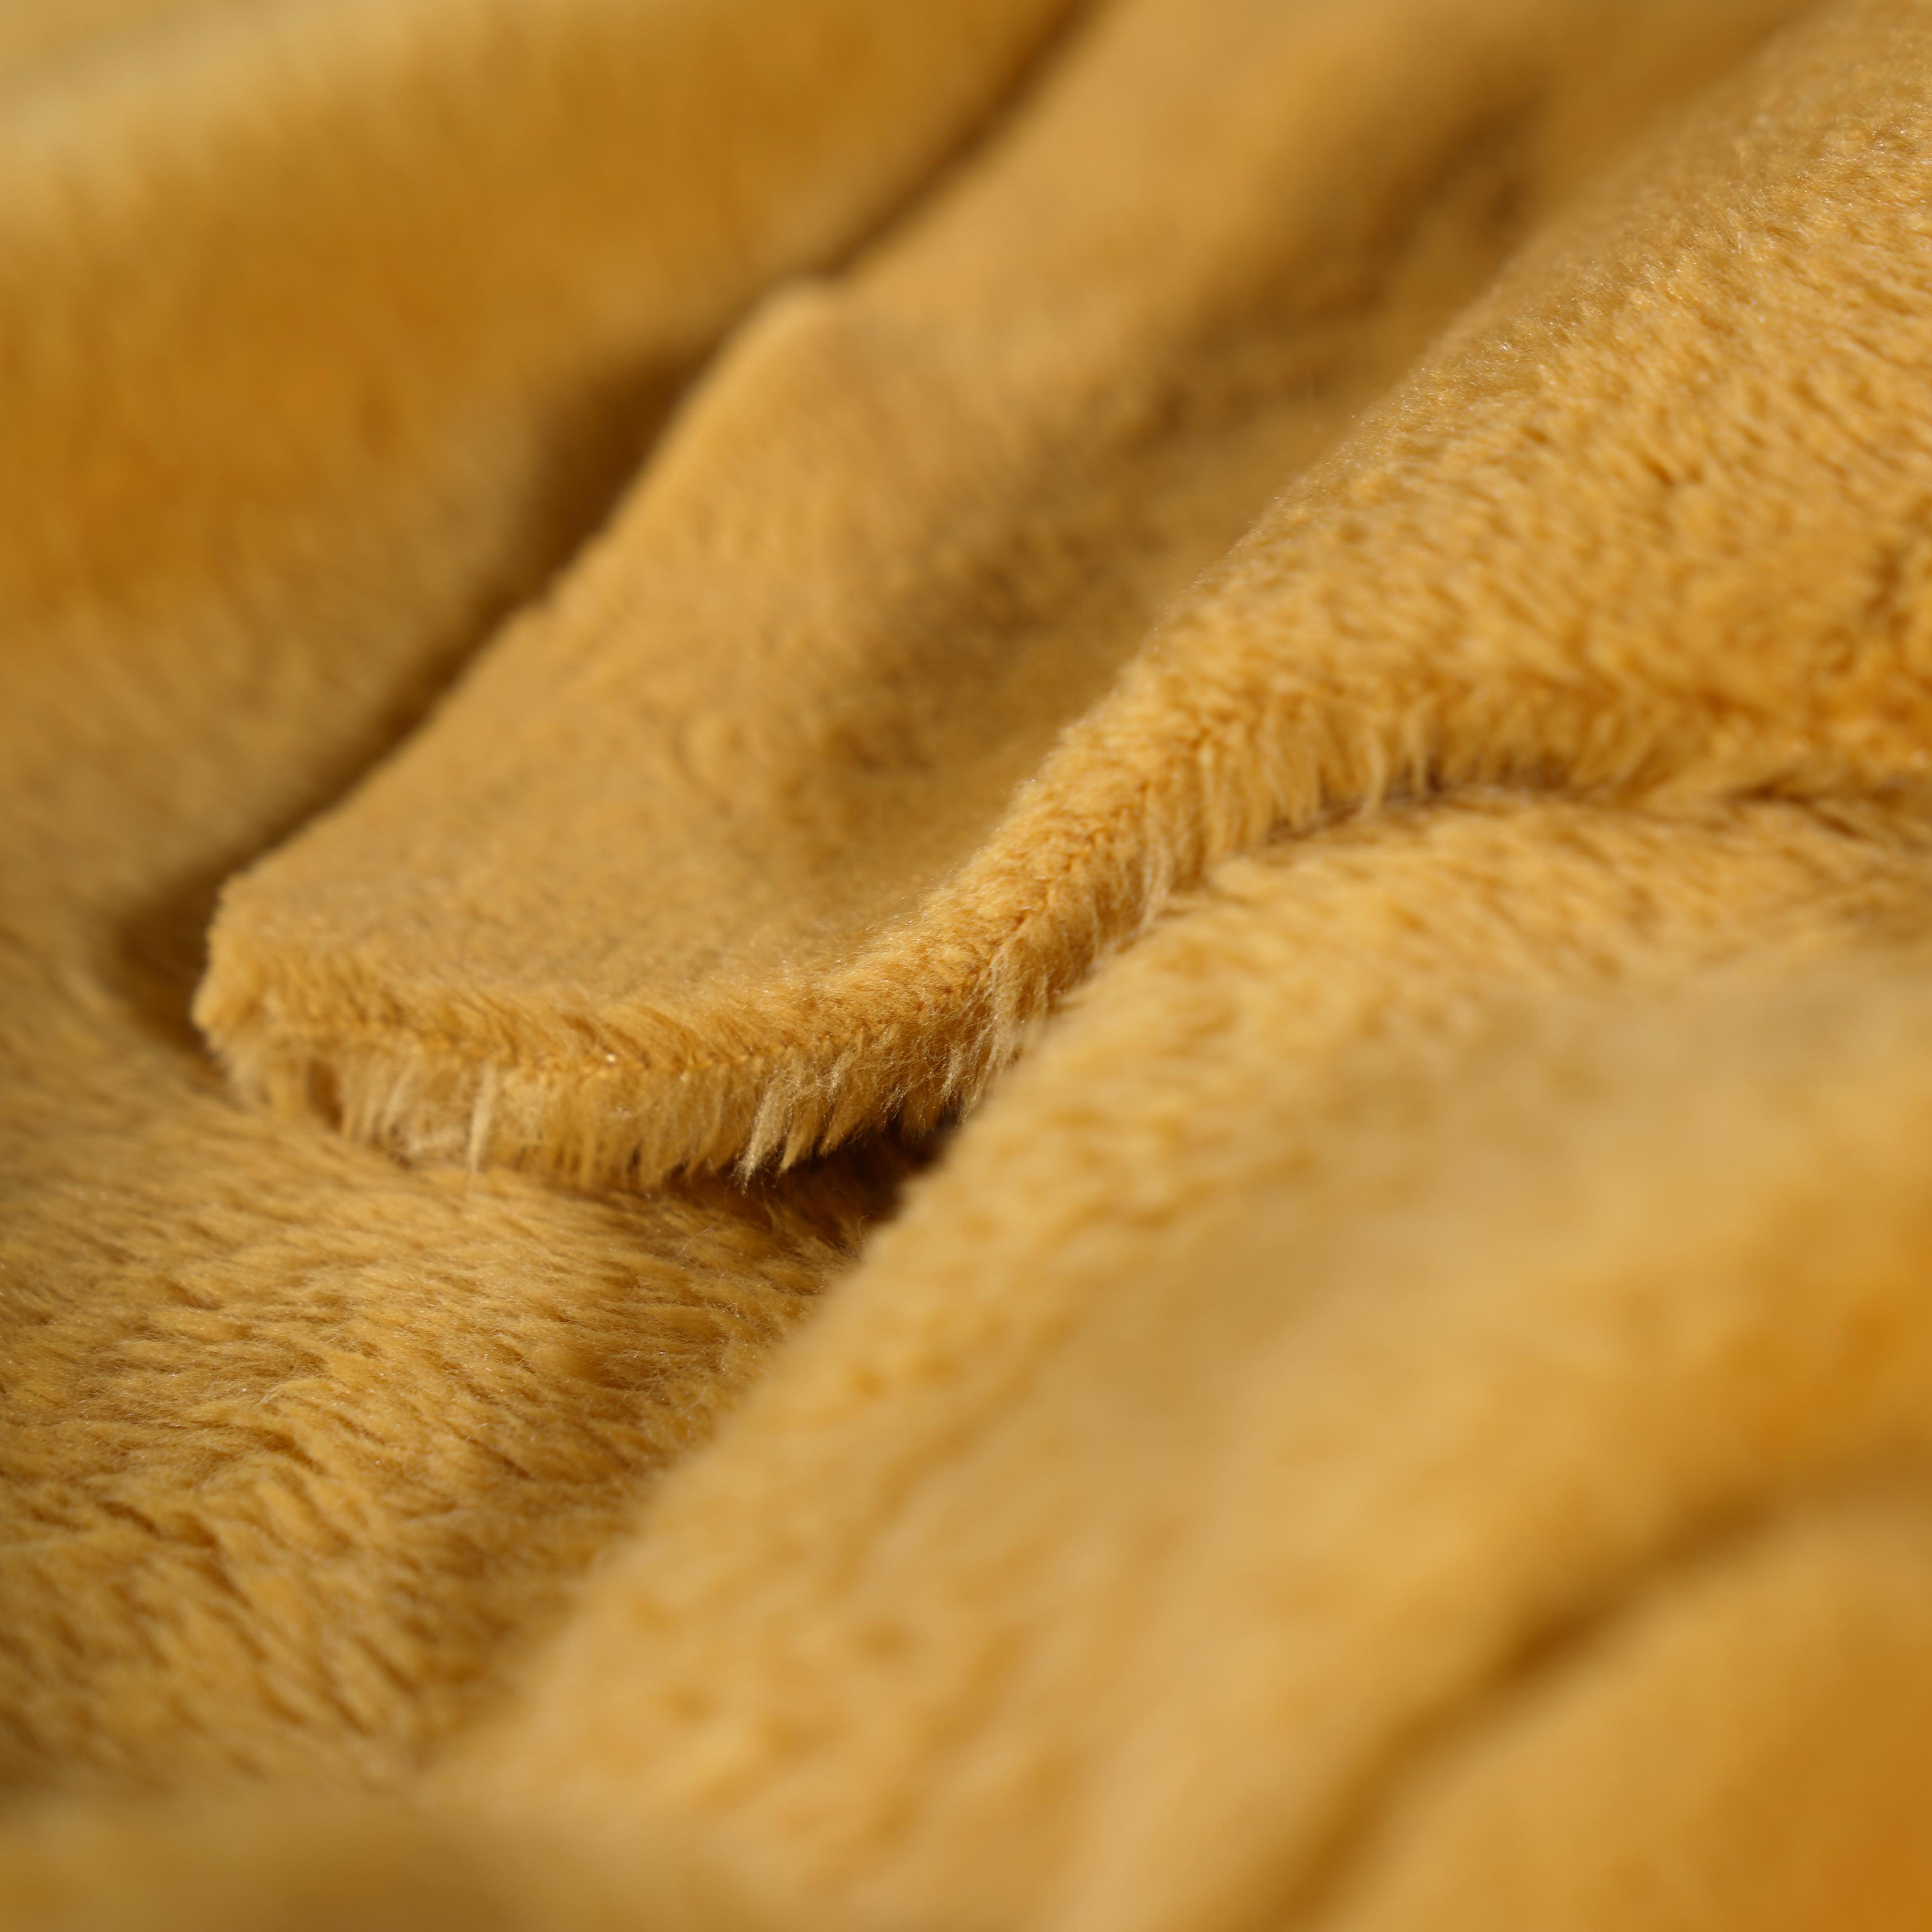 Трикотажная фланелевая ткань из 100% полиэстера, фланелевая флисовая ткань, флисовая ткань для одеял